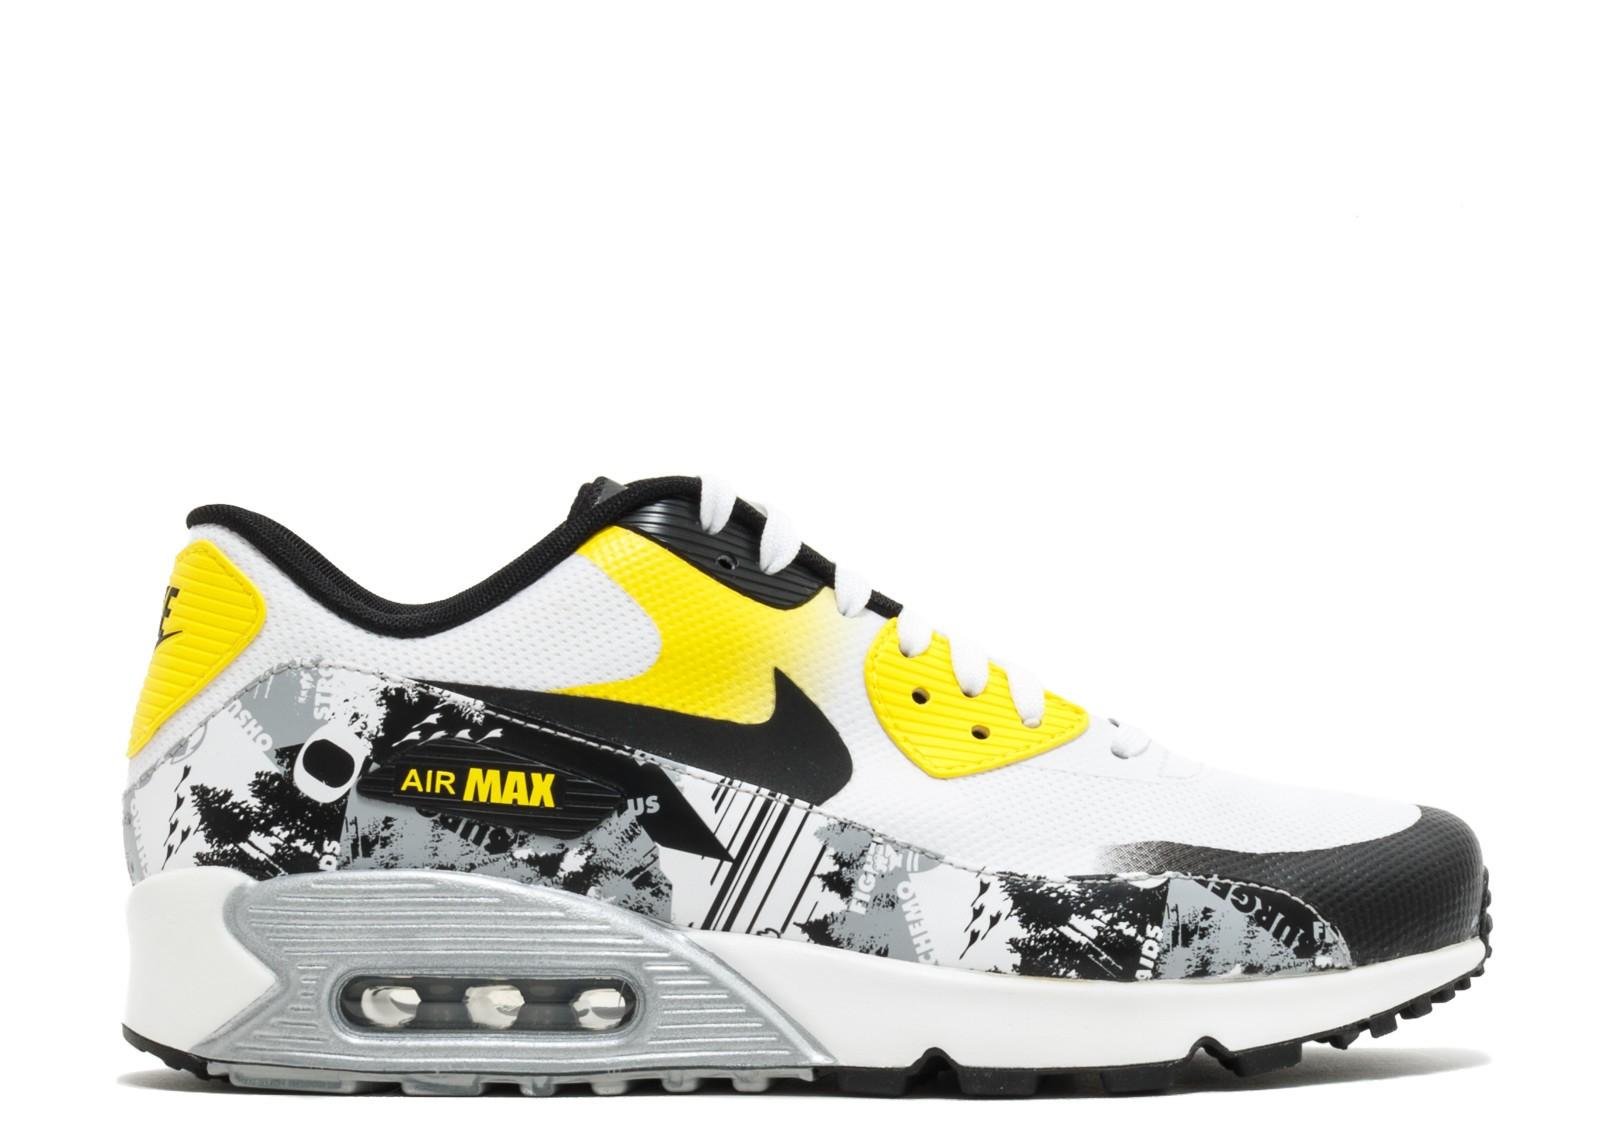 50128d15f49 Nike Air Max 90 Premium Db Doernbecher Dynamic White Black Yellow ...